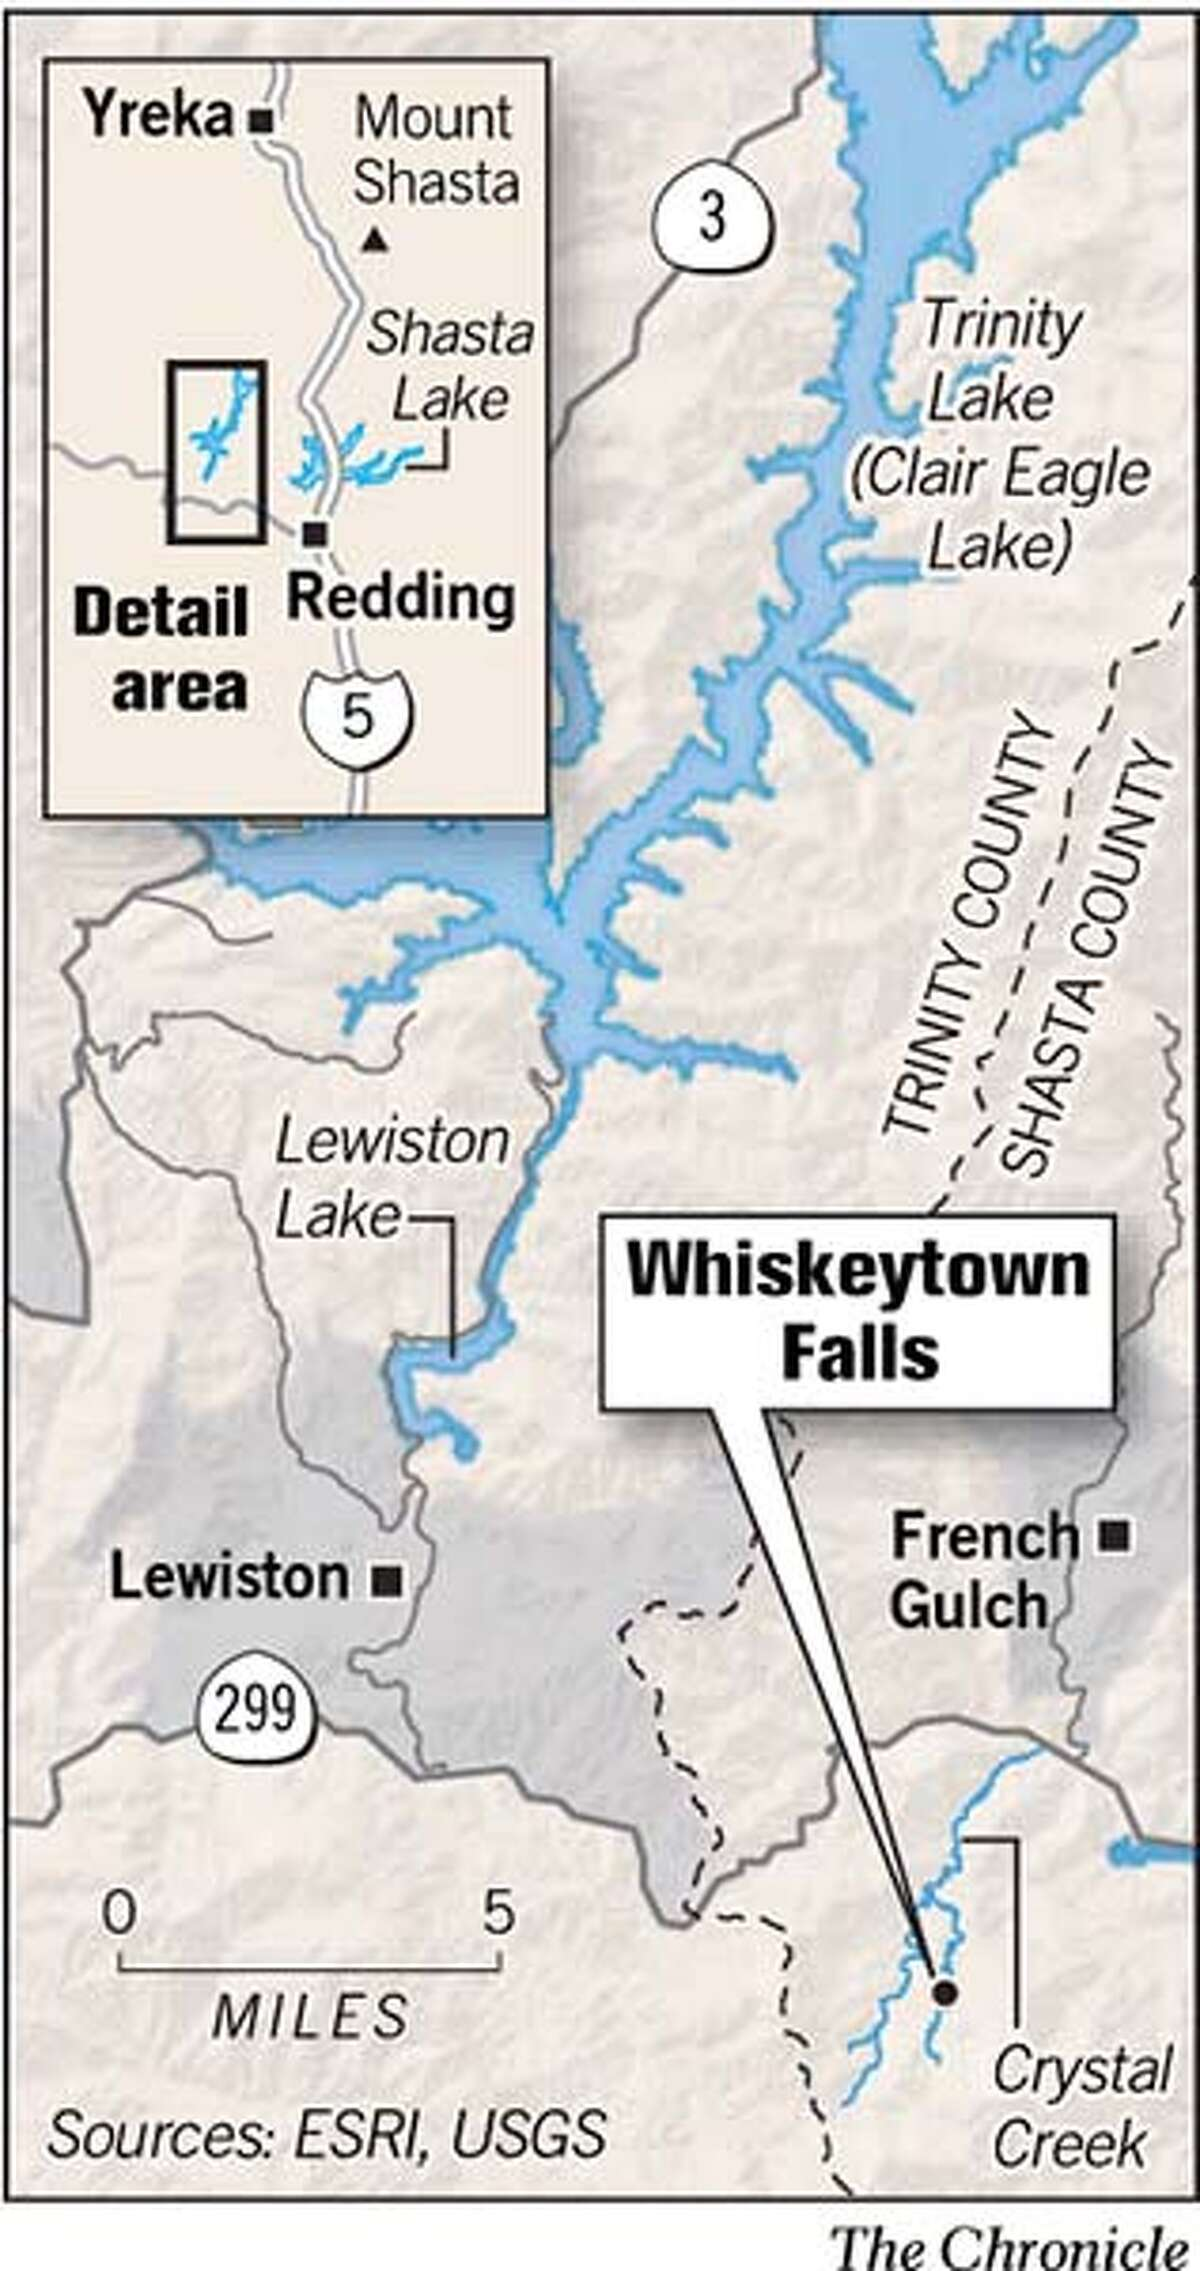 WhiskeyTown Falls